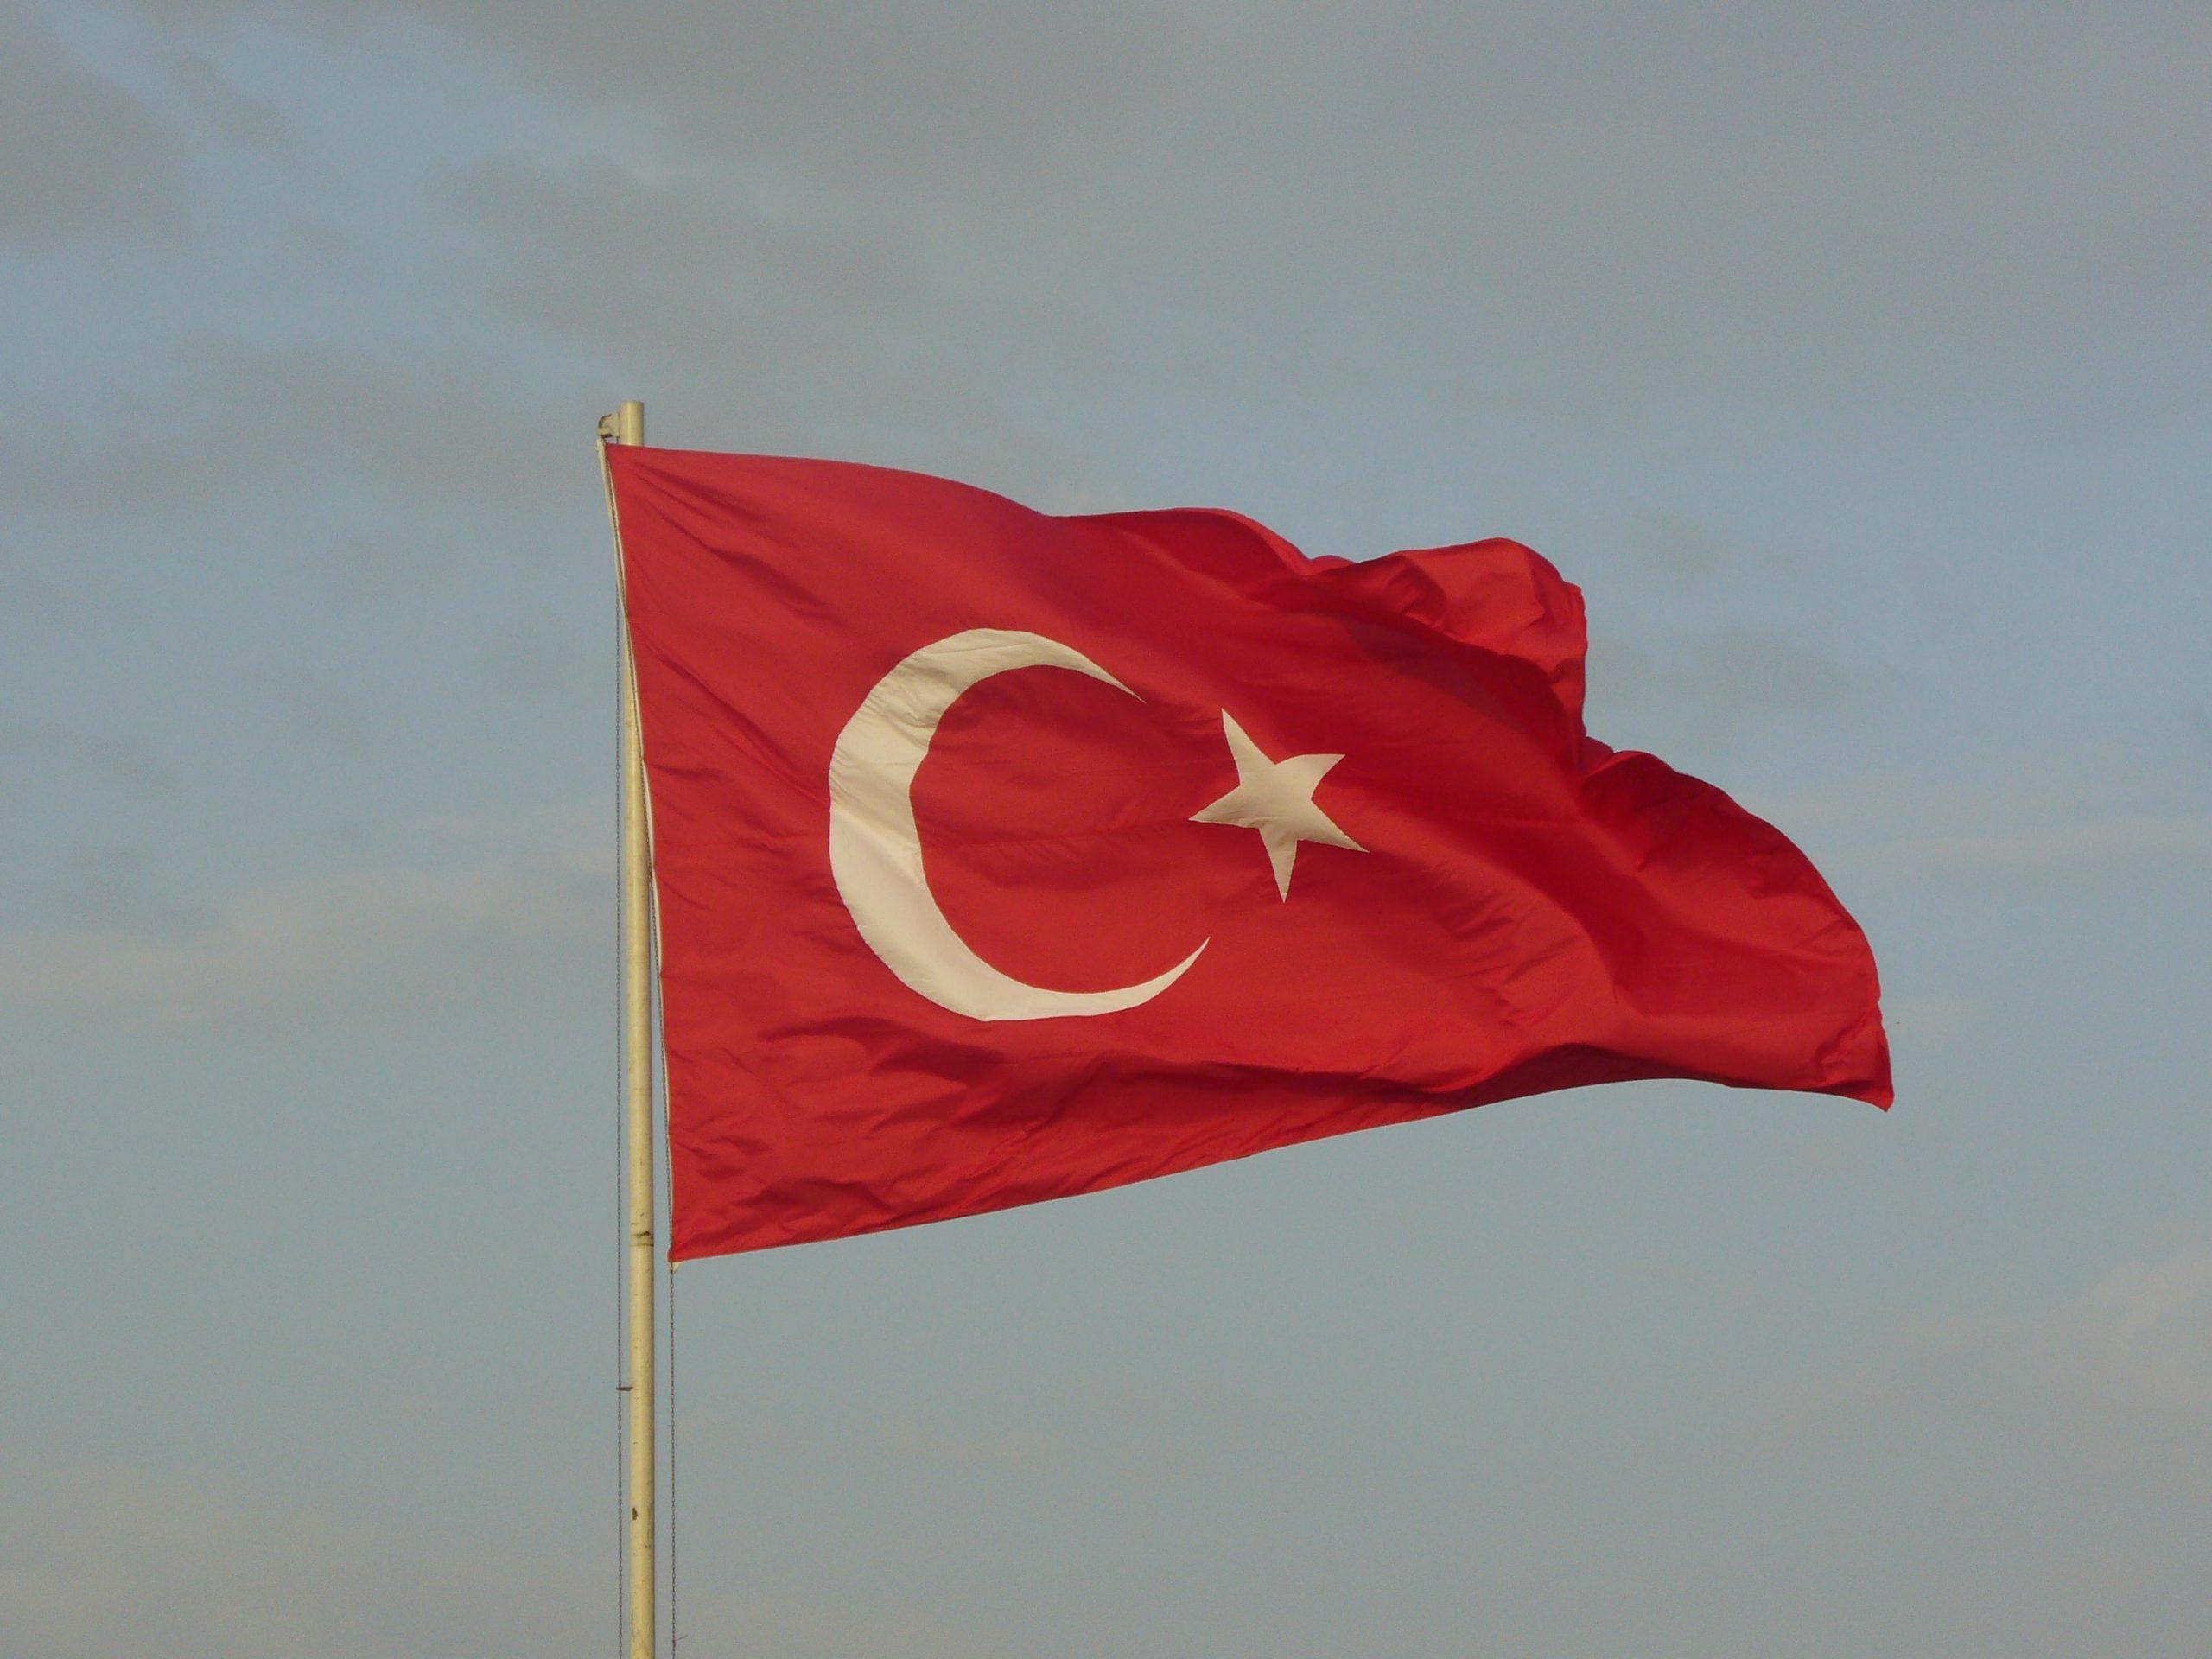 Turkey; Türkiye; UPR; UN; Universal Periodic Review